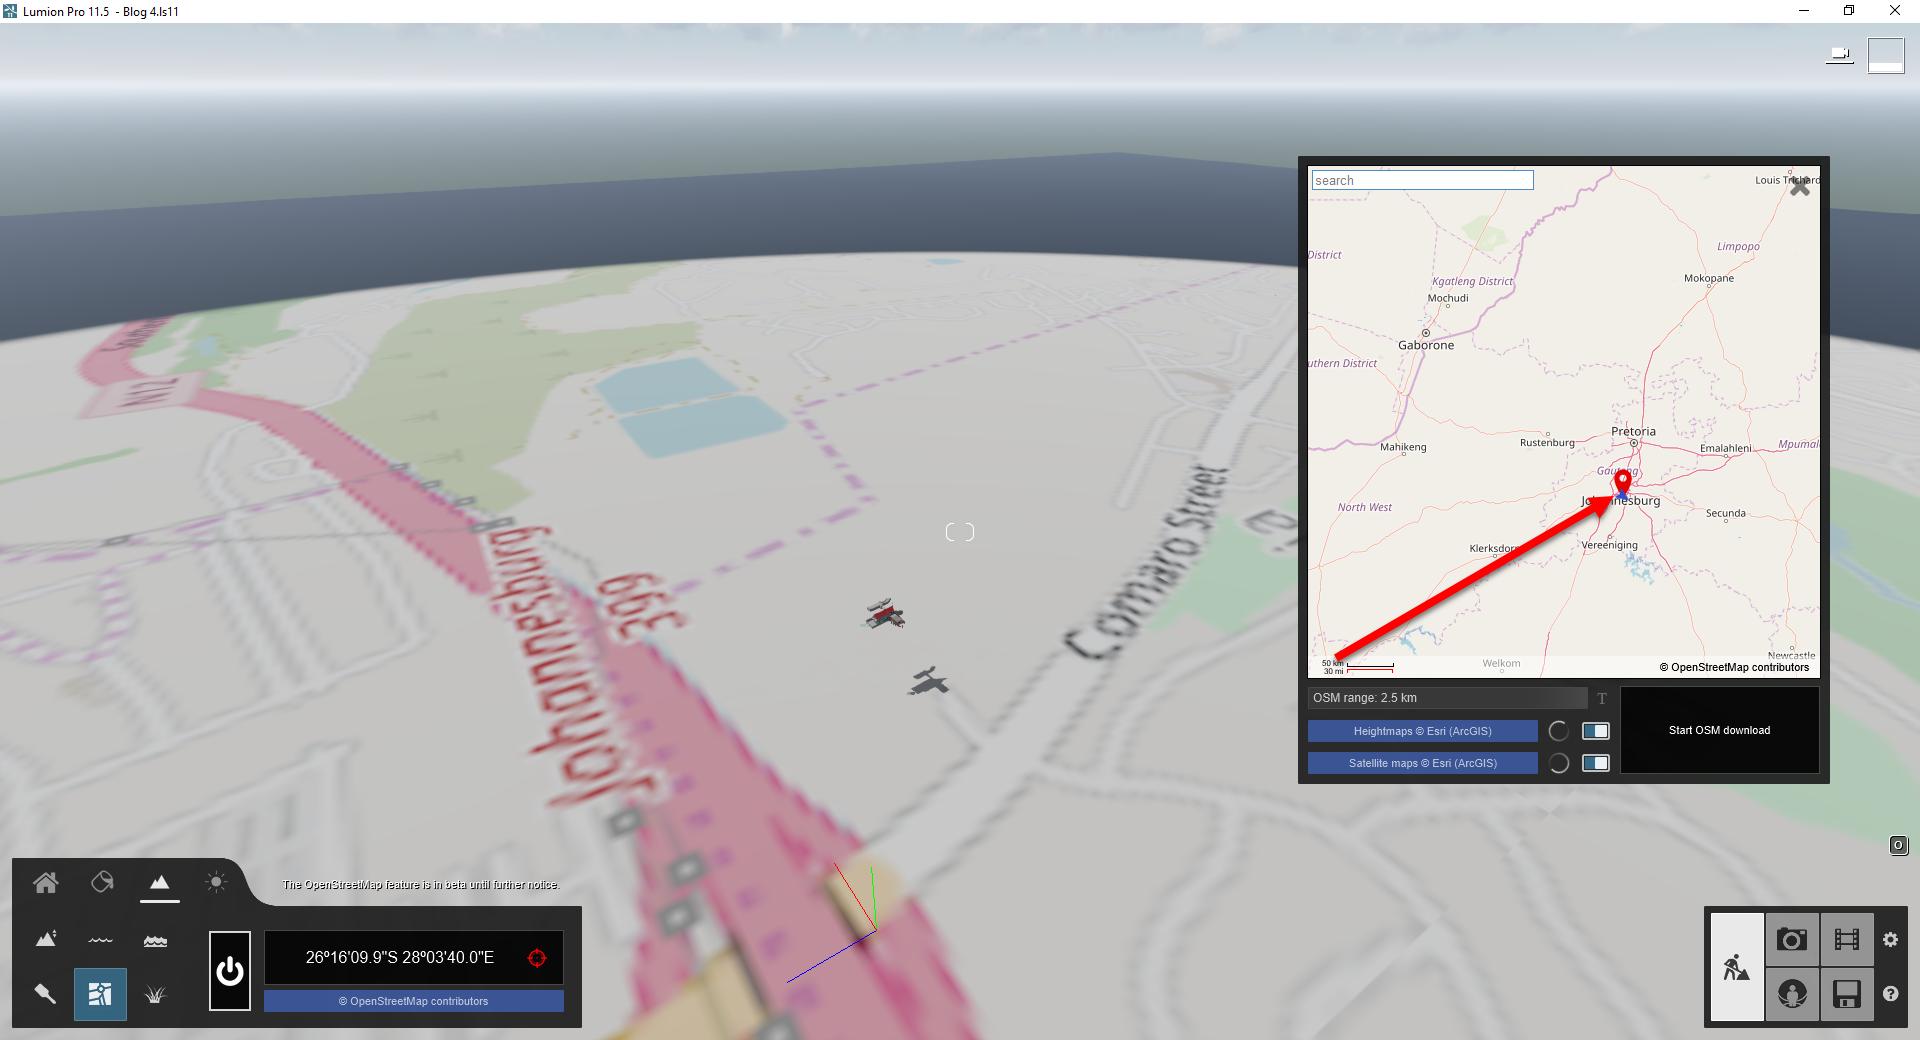 Lumion 11, Open Street Map, Chance Location